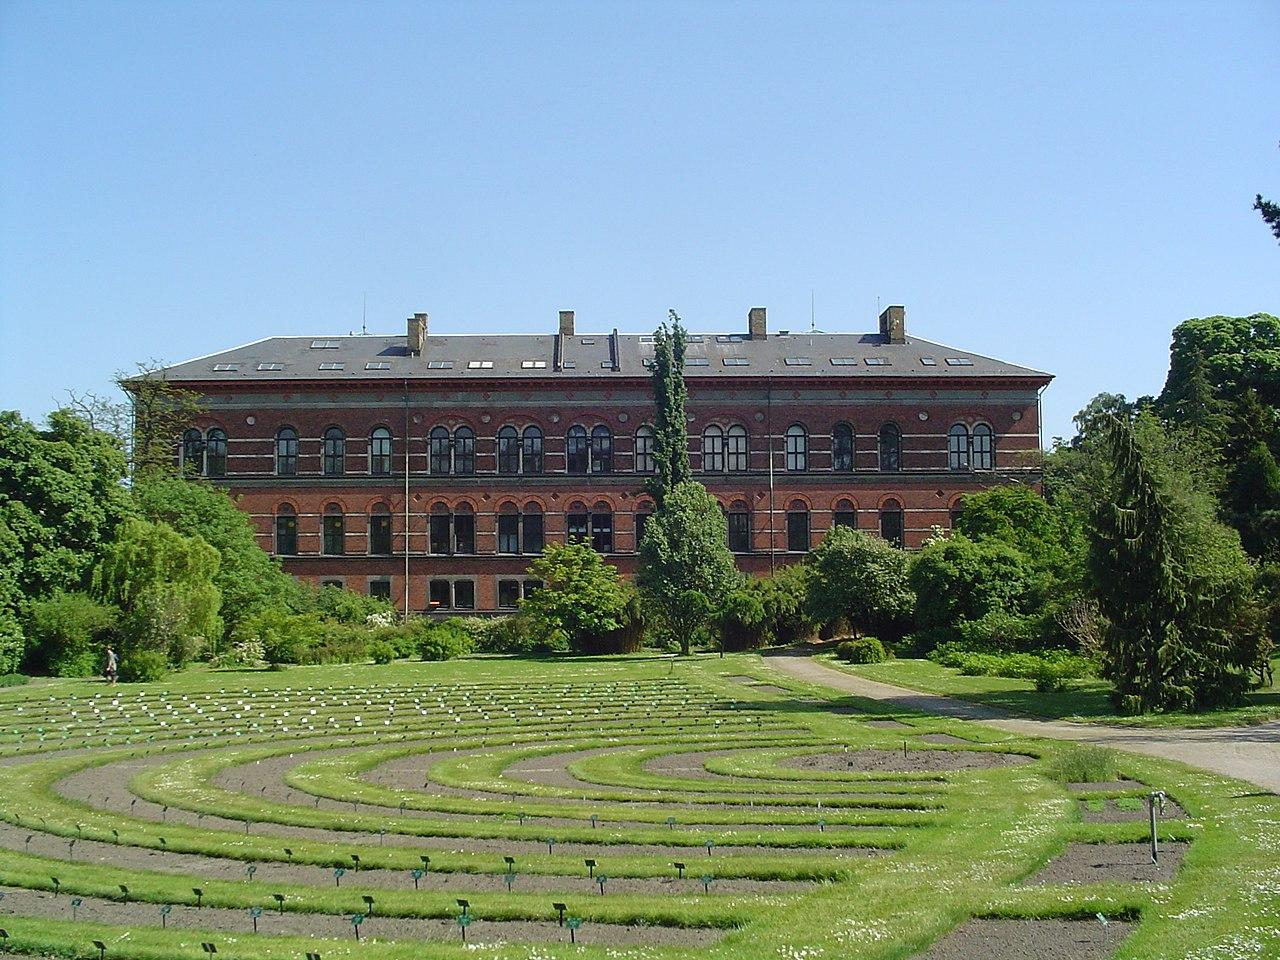 Copenhagen university address